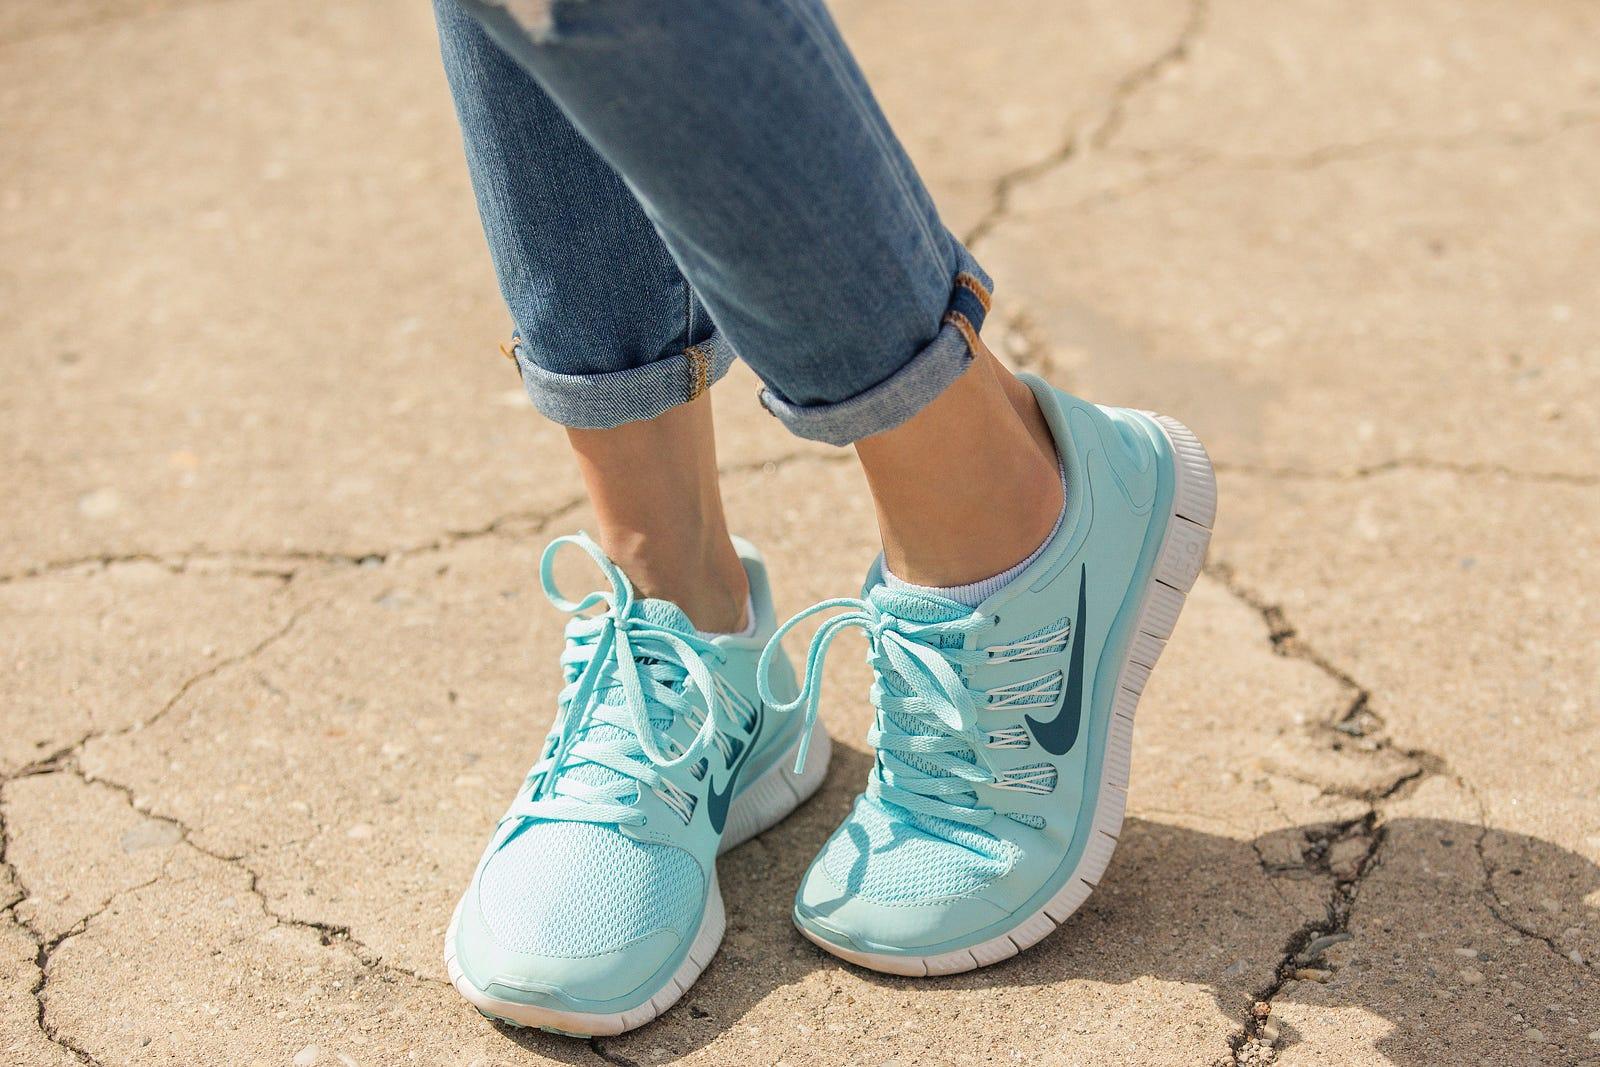 Their Athletic Footwear The Wear Women City How In sCxtQrdBh